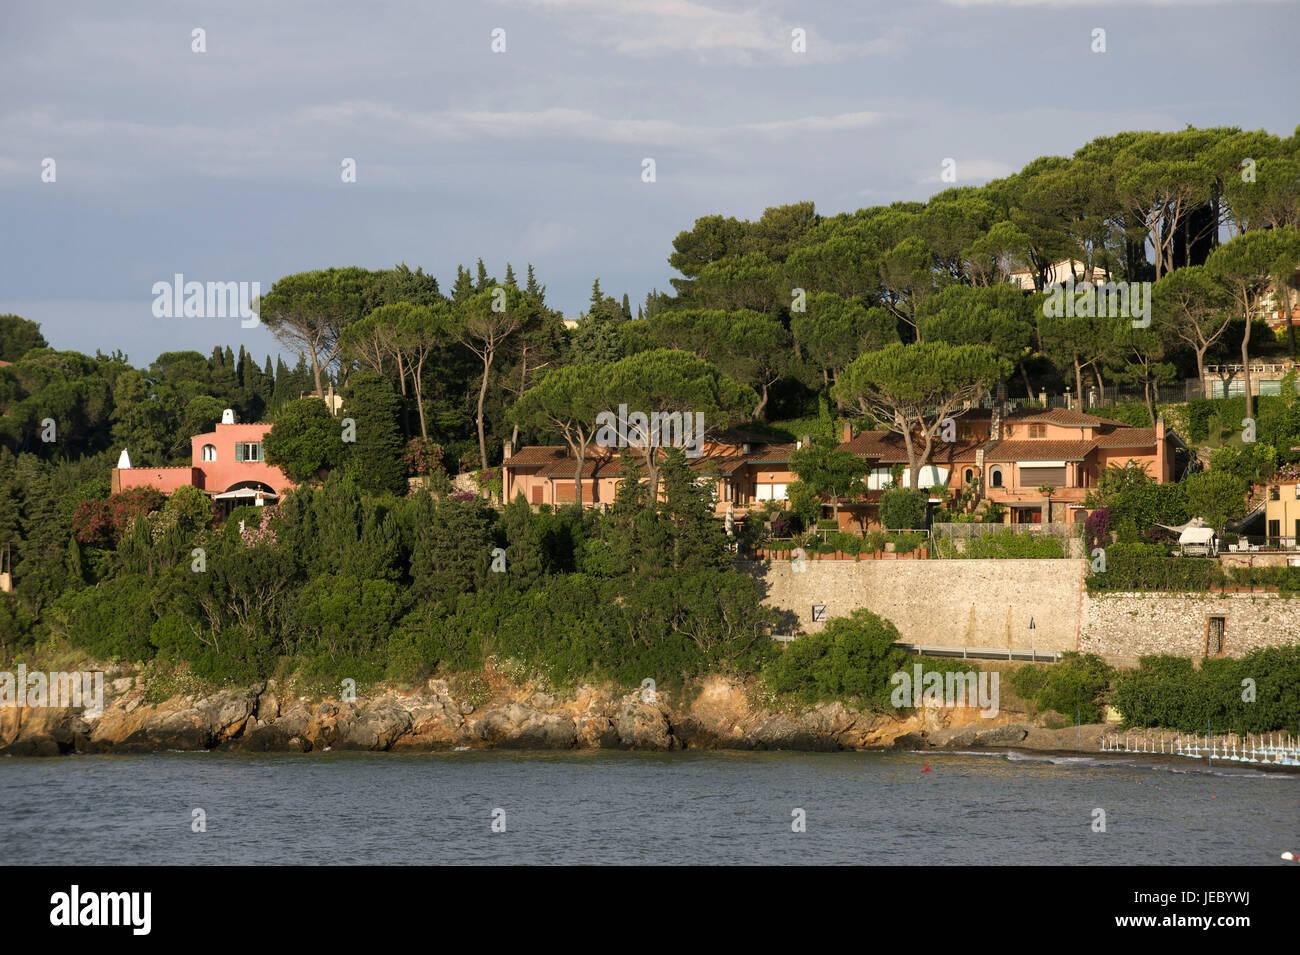 Italy, Tuscany, La Maremma, Monte Argentario, houses by the sea, - Stock Image